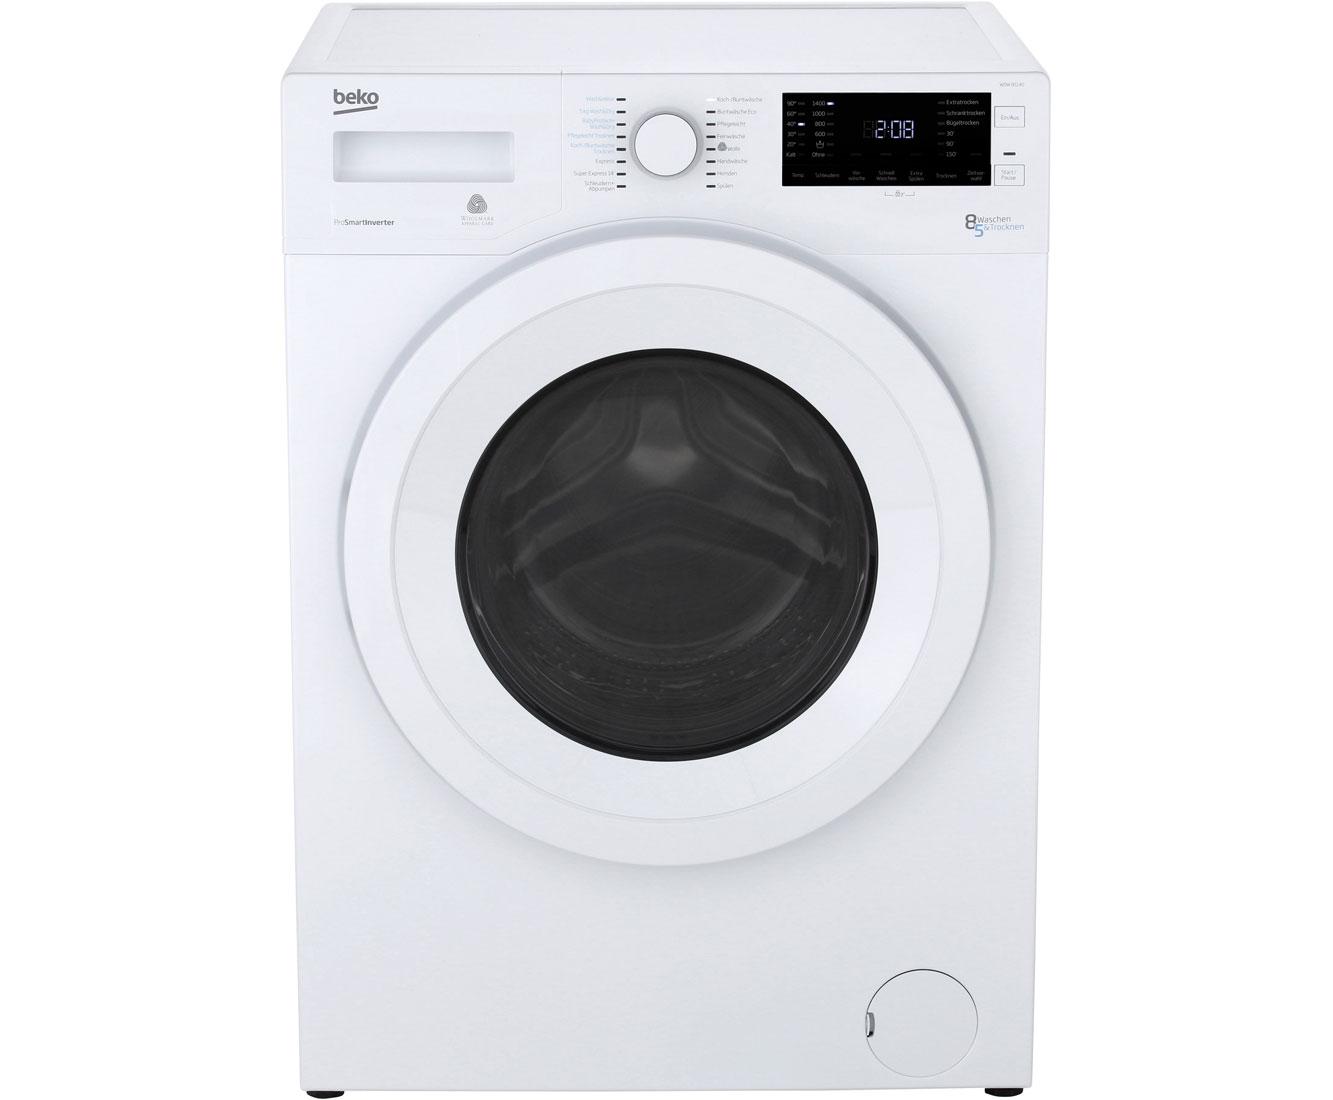 Beko WDW 85140 Waschtrockner Green line-Serie Weiß | eBay